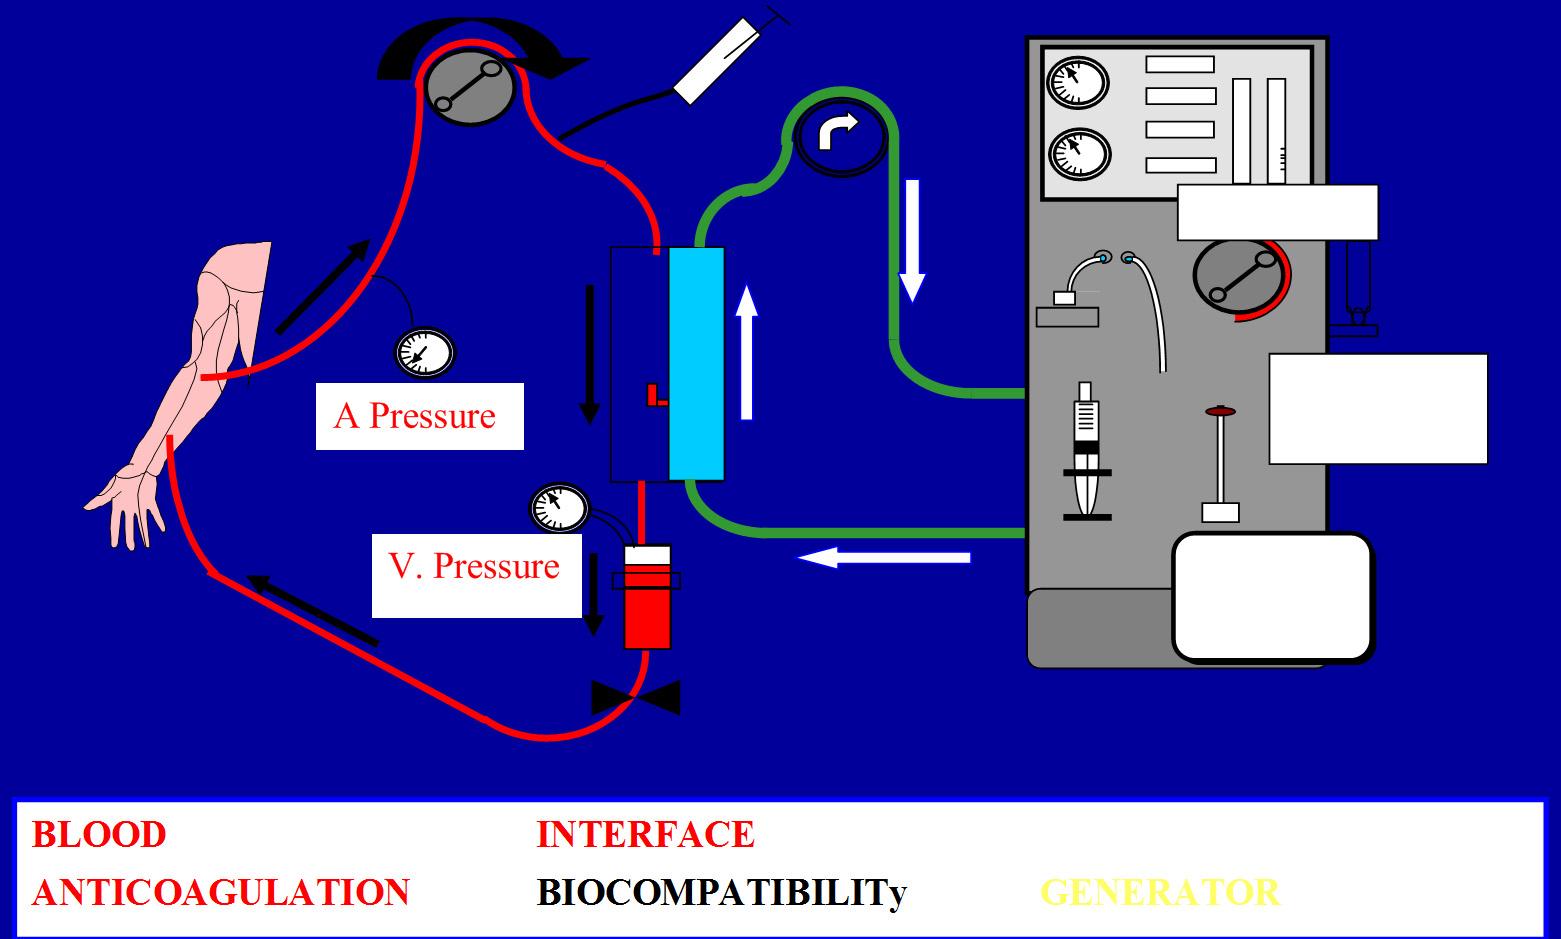 arteriovenous fistula or catheter creating an optimal vascular